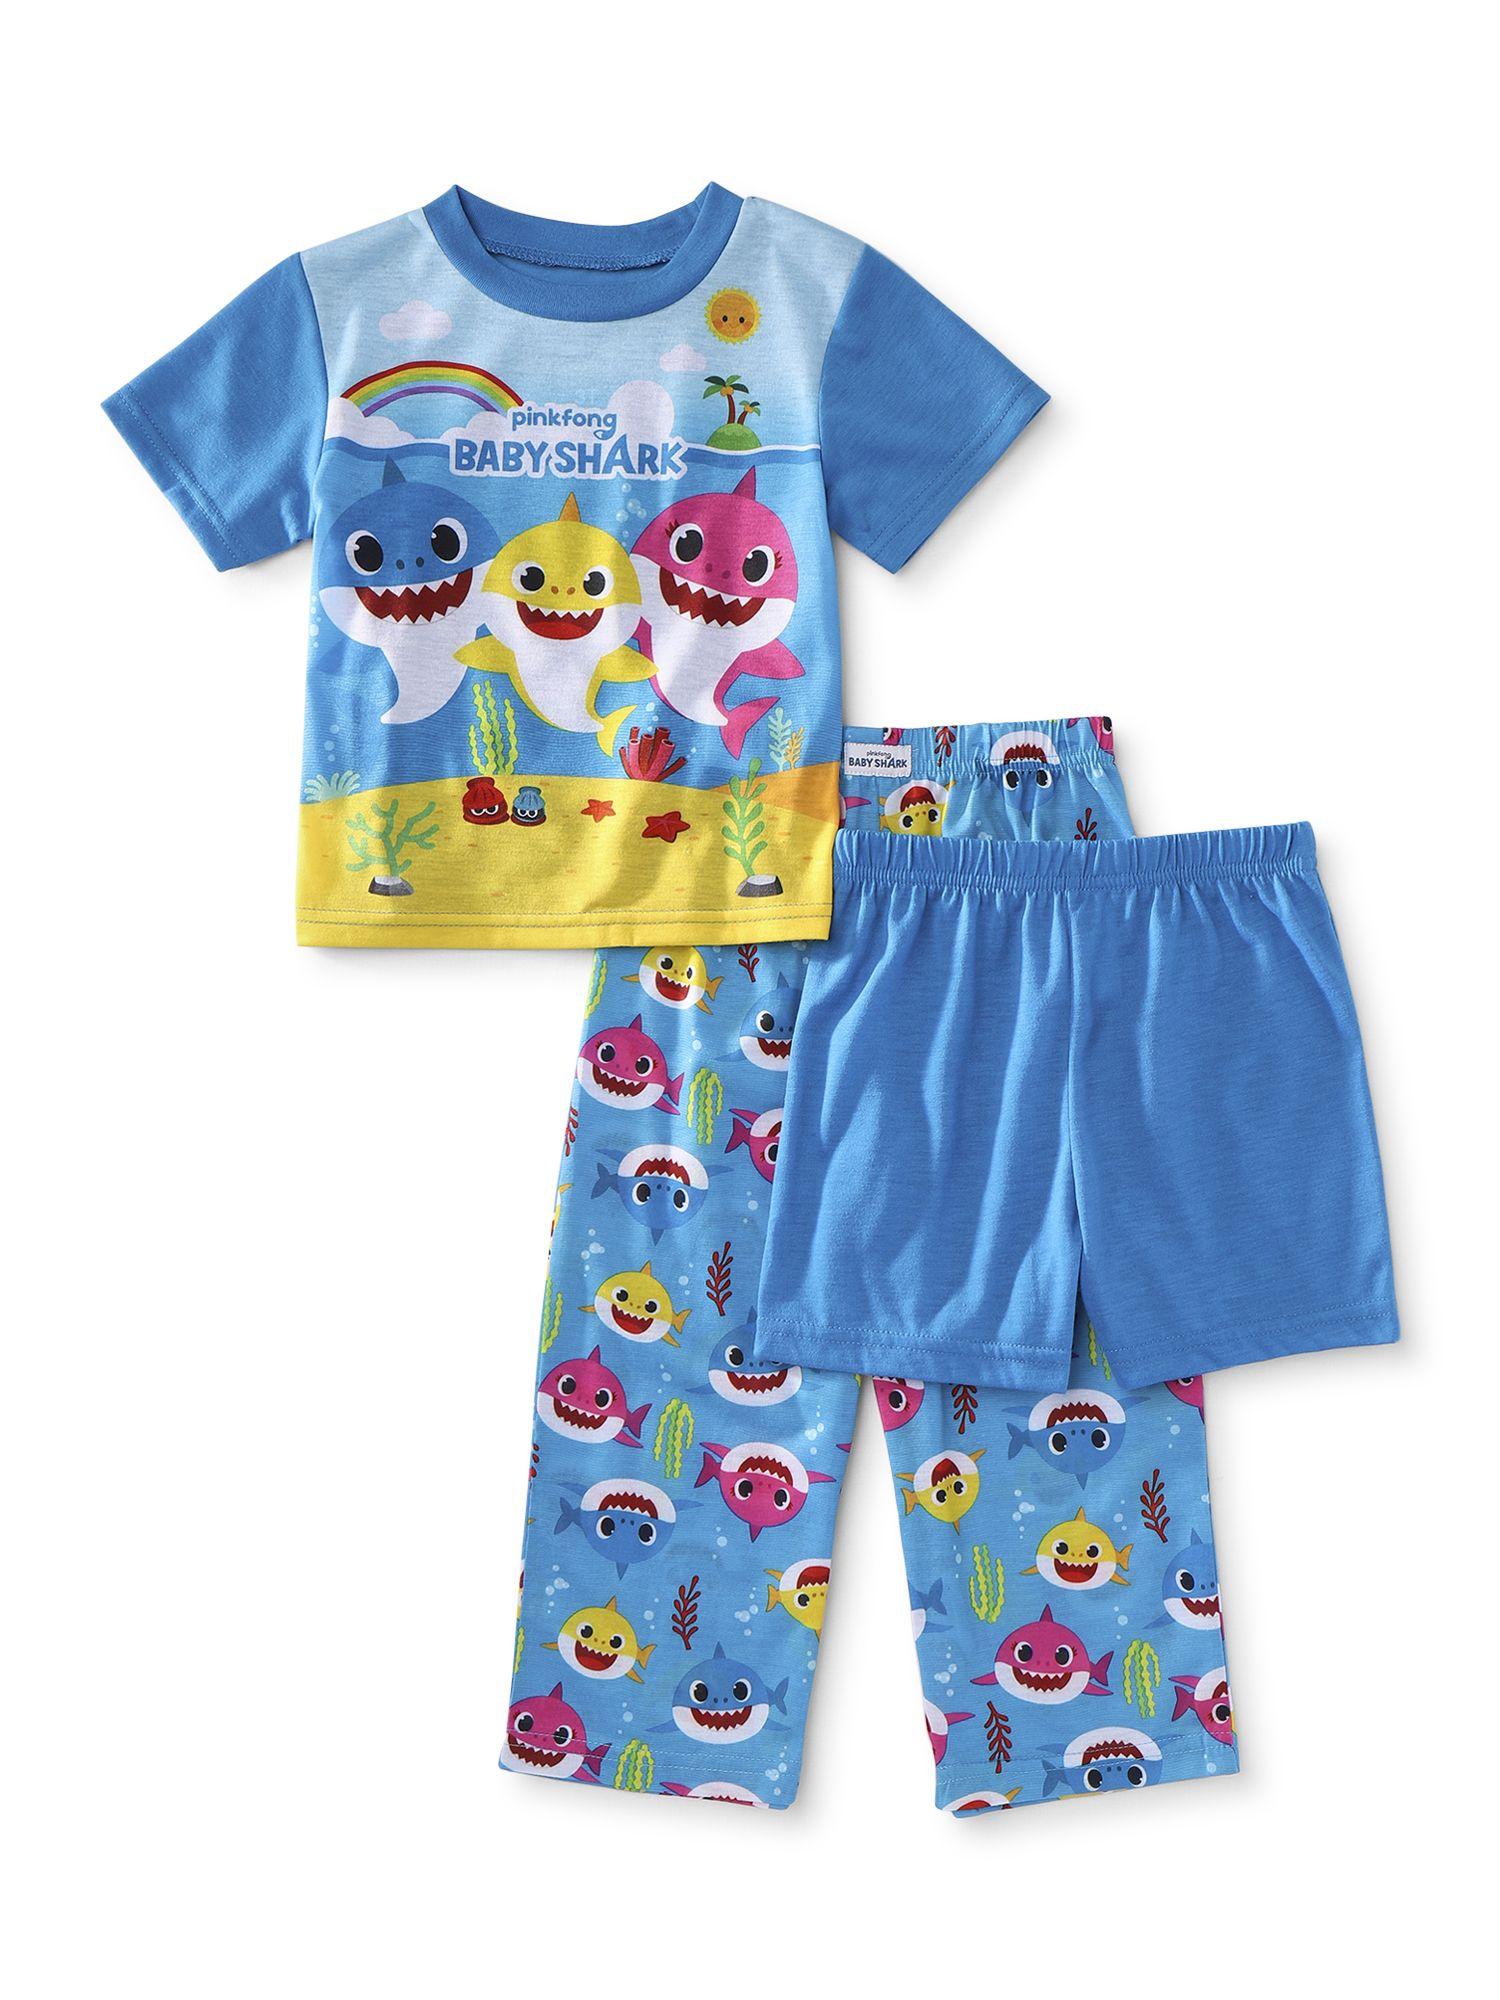 Clothing in 2020 Boy shorts, Toddler boys, Baby shark